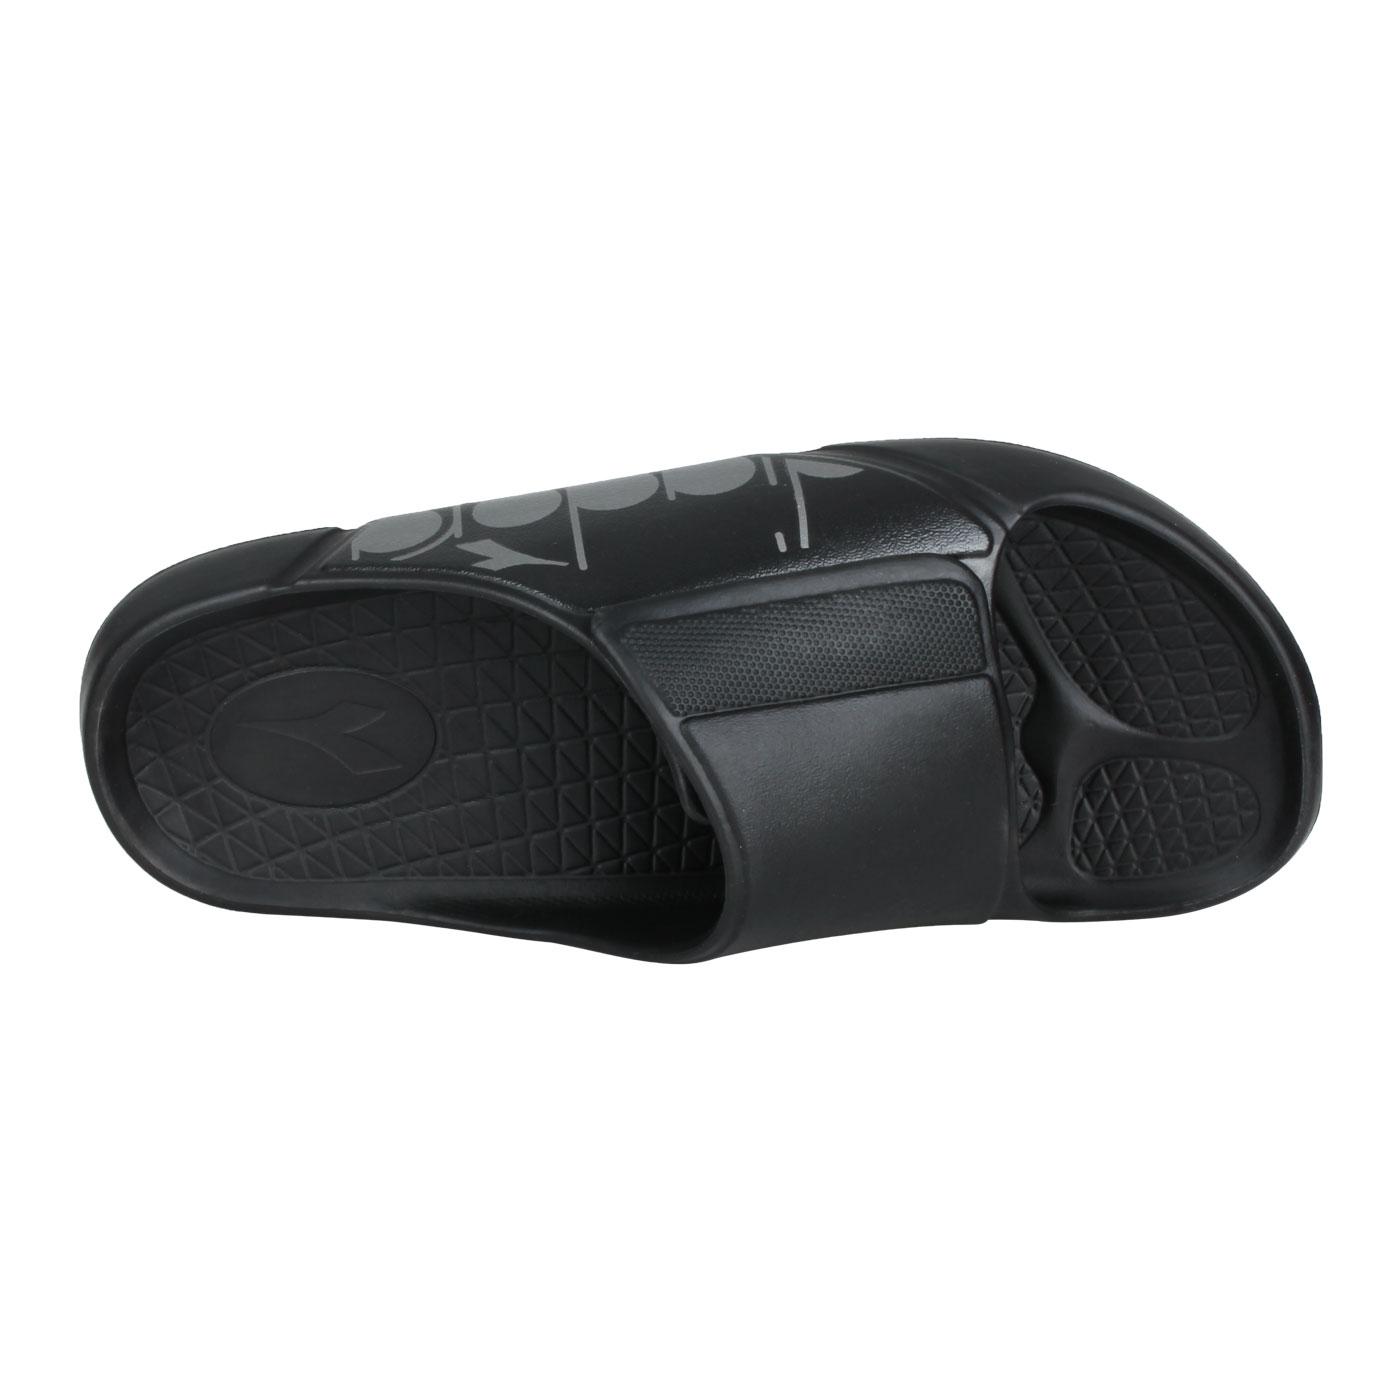 DIADORA 男款MIT拖鞋 DA71219 - 黑銀